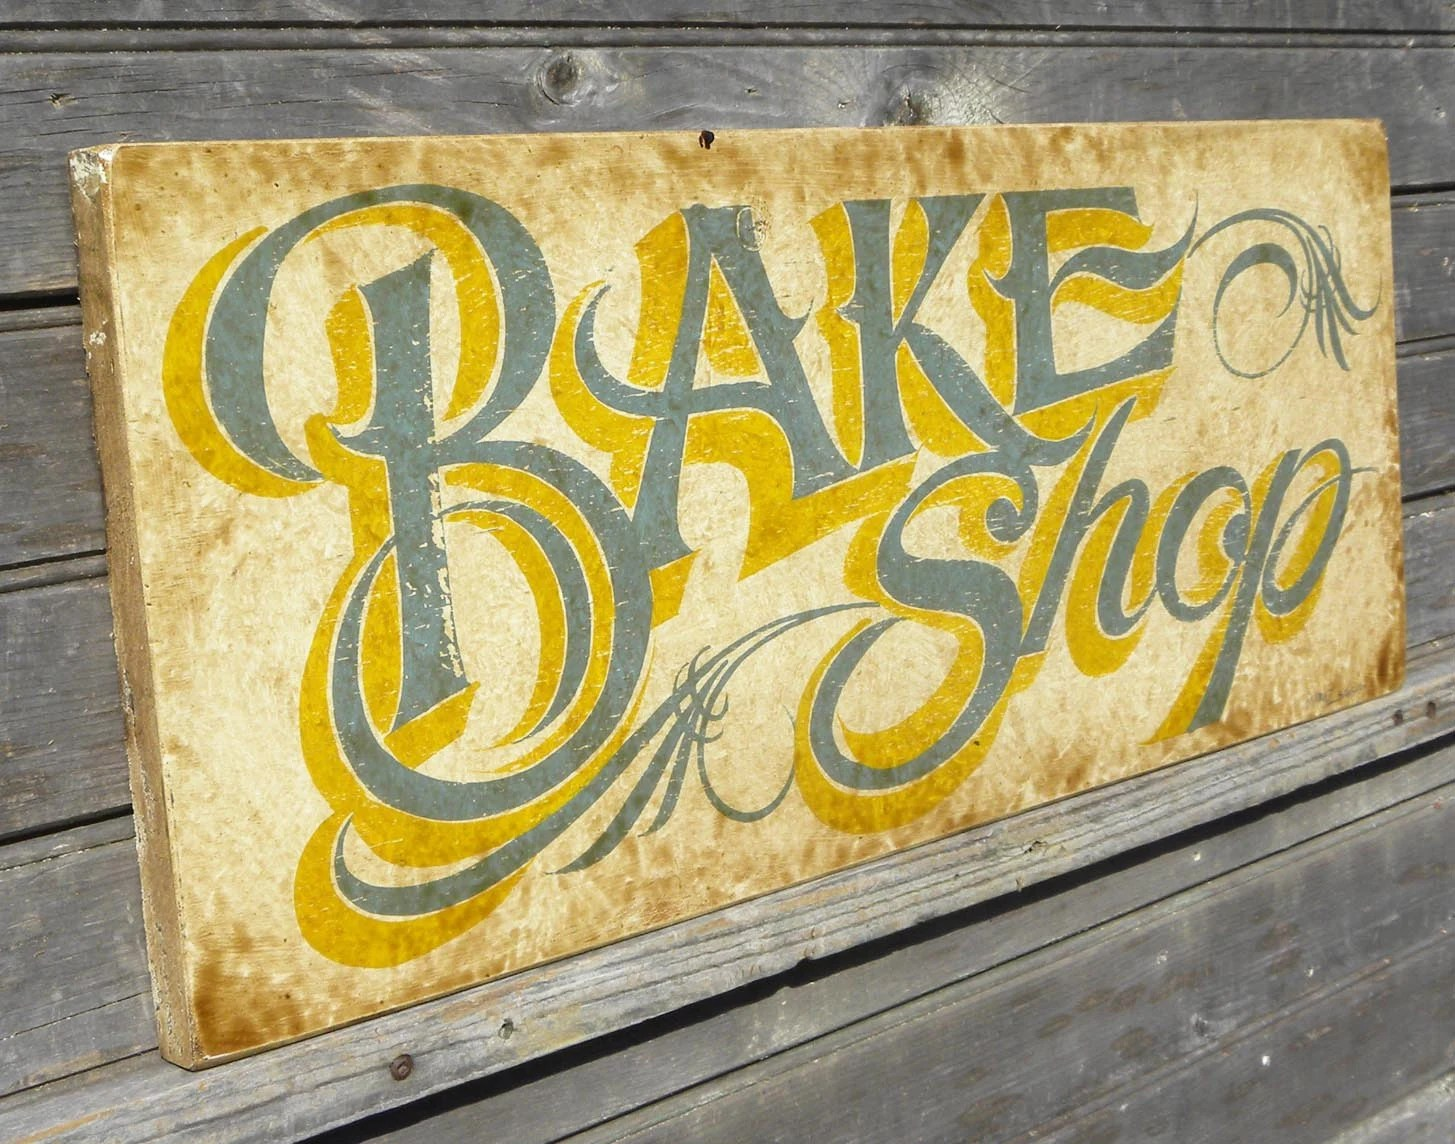 green apple kitchen decor counter rack bake shop sign faux vintage original hand painted wood